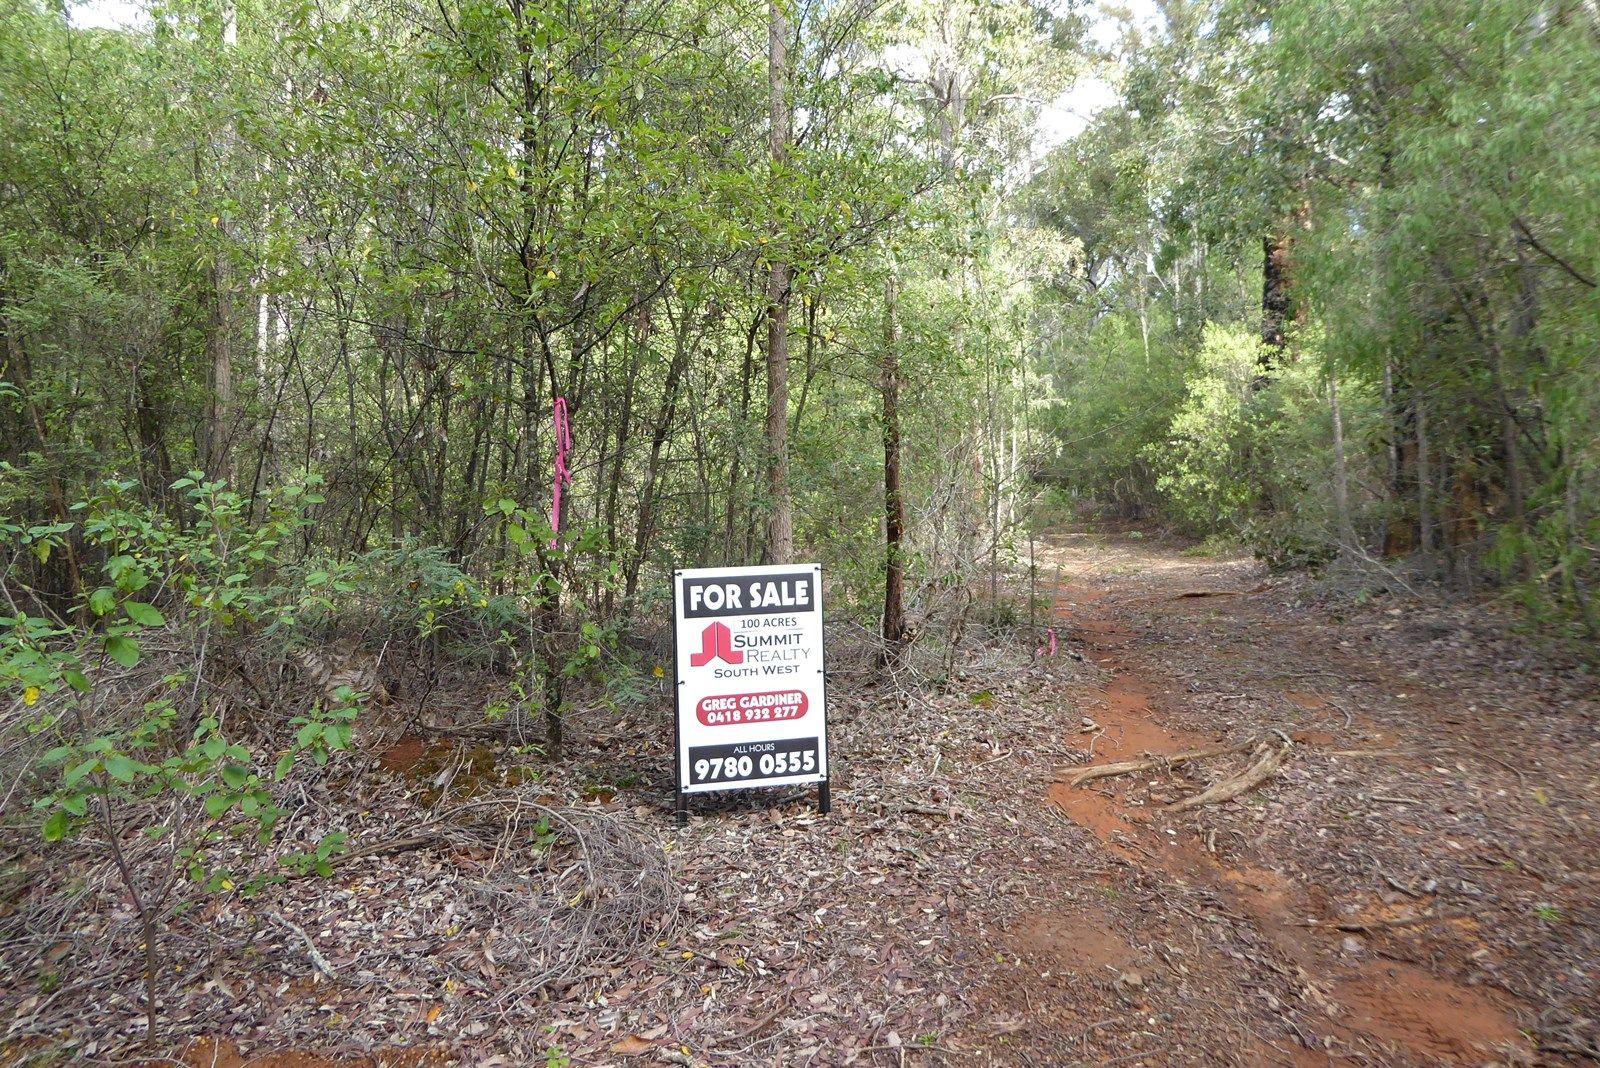 2147/2148 Corbet Road, Wellington Forest WA 6236, Image 2